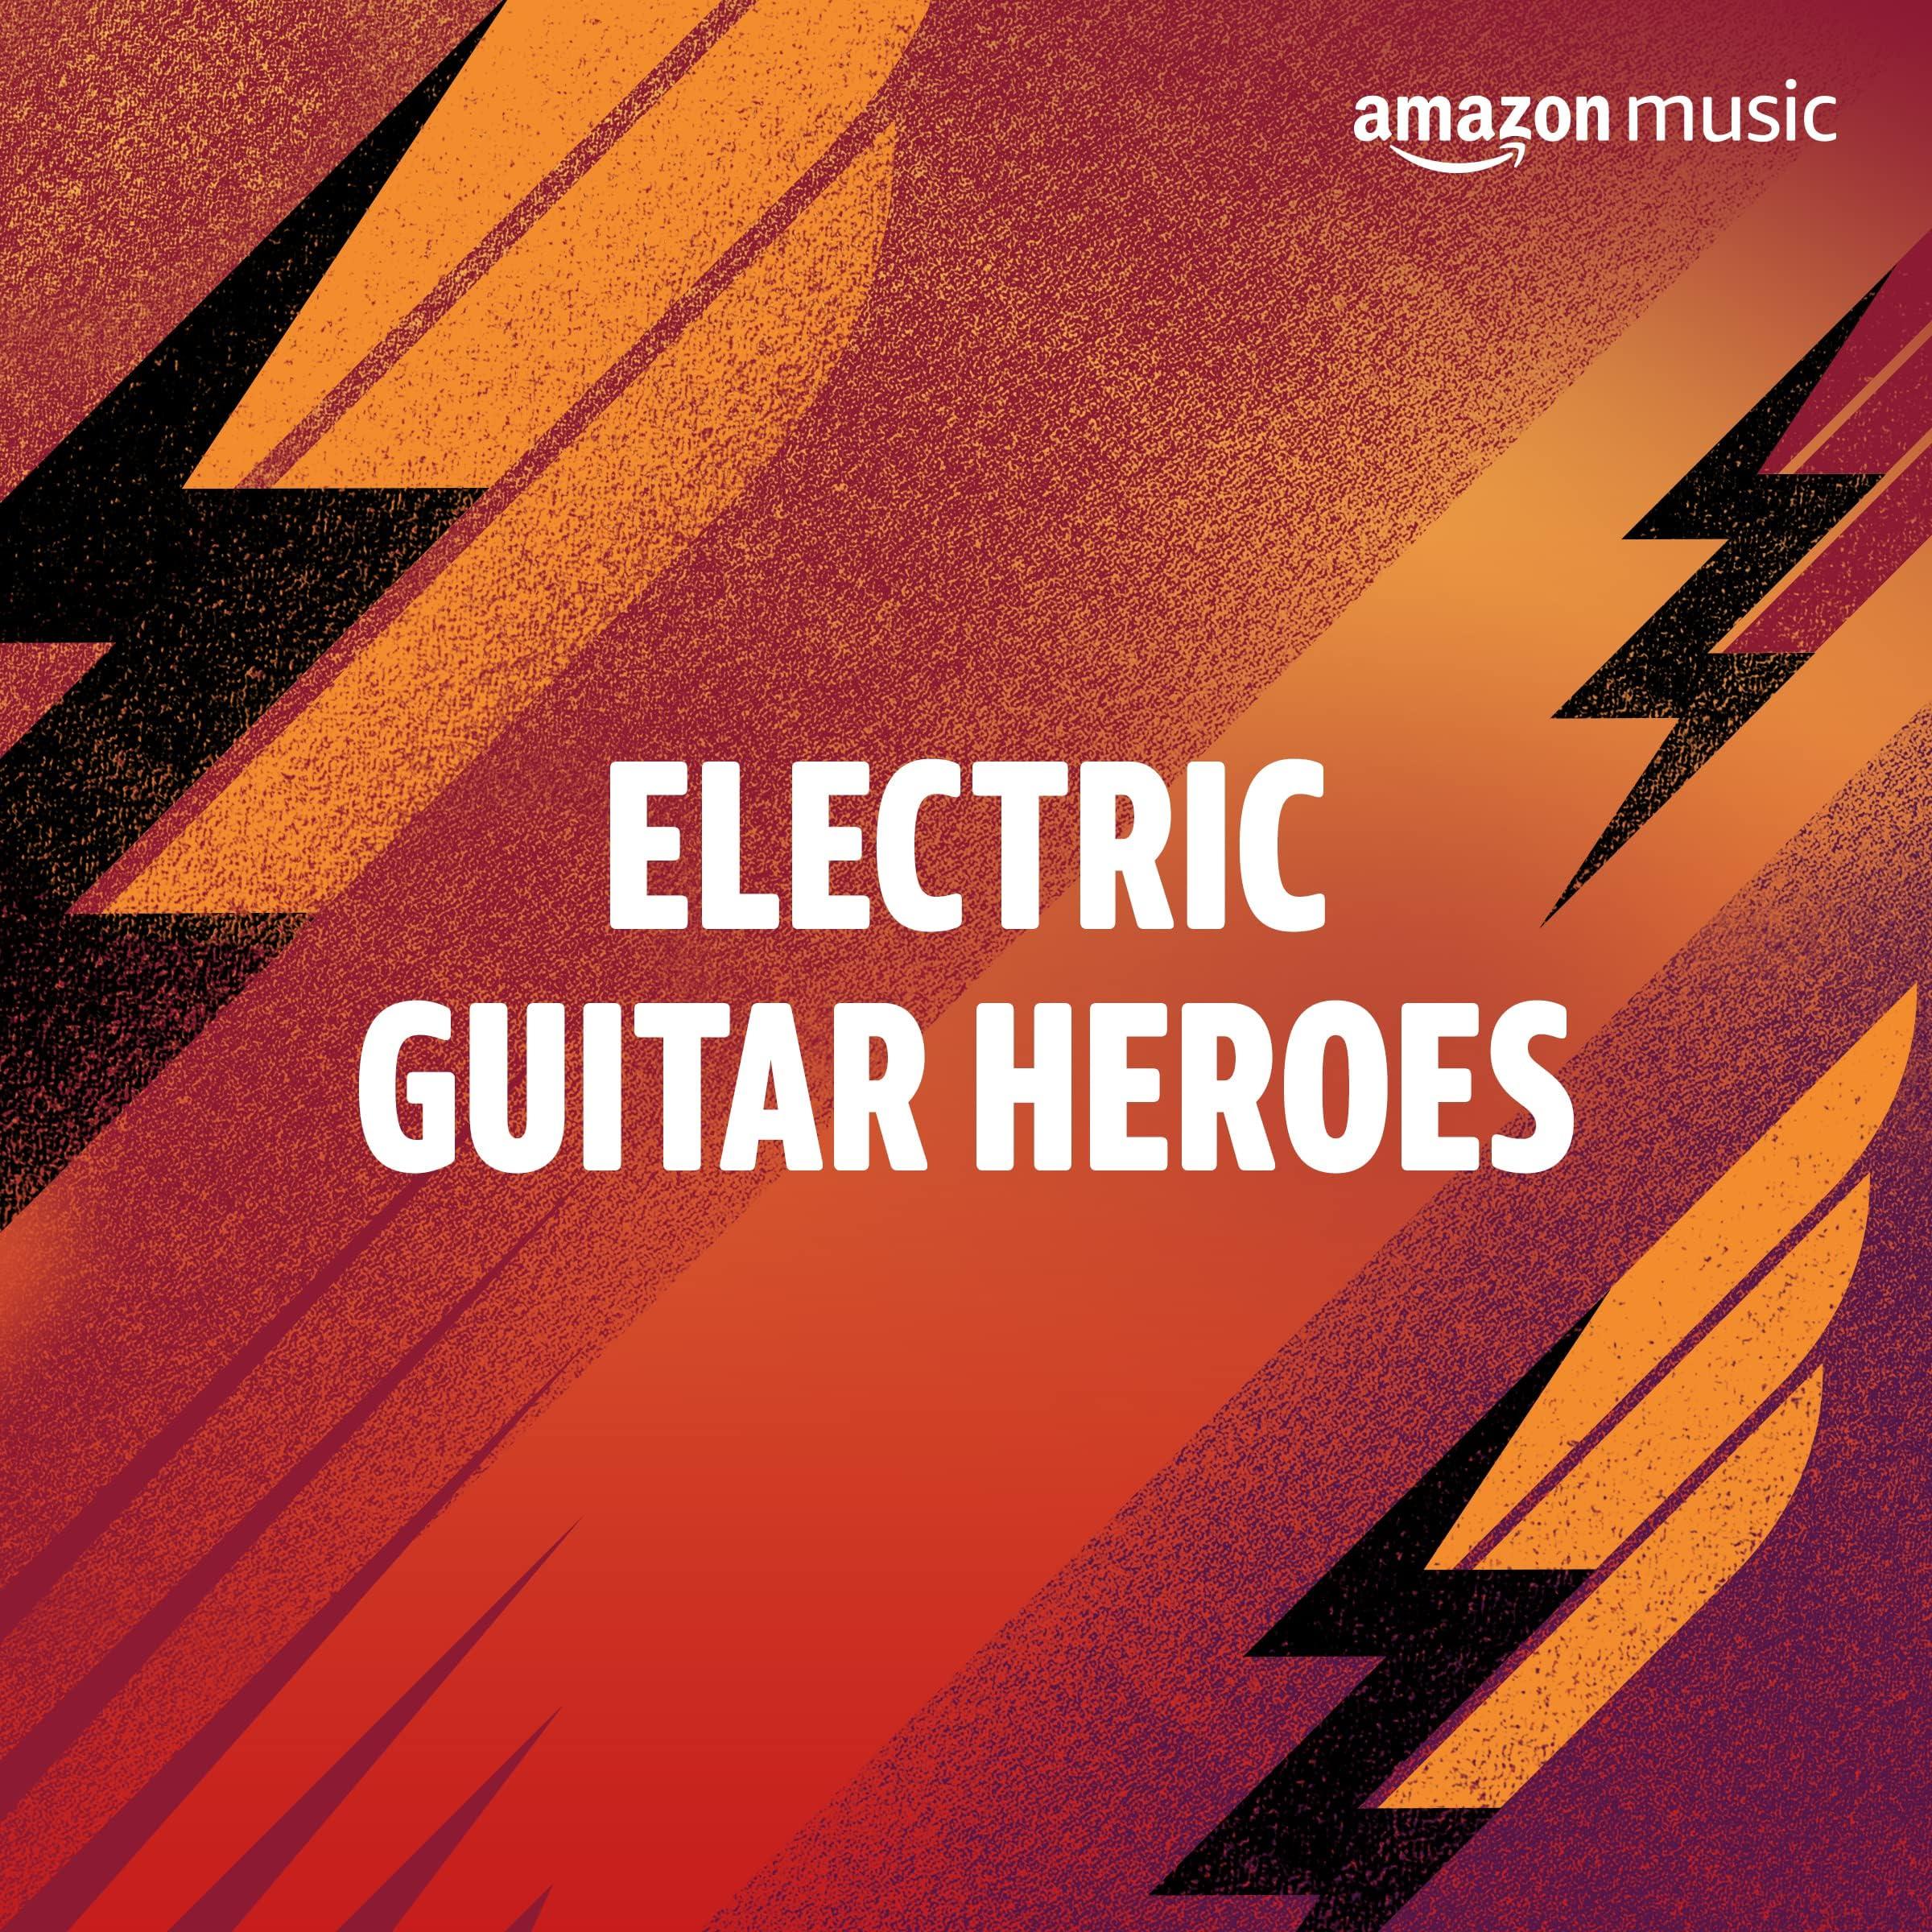 Electric Guitar Heroes